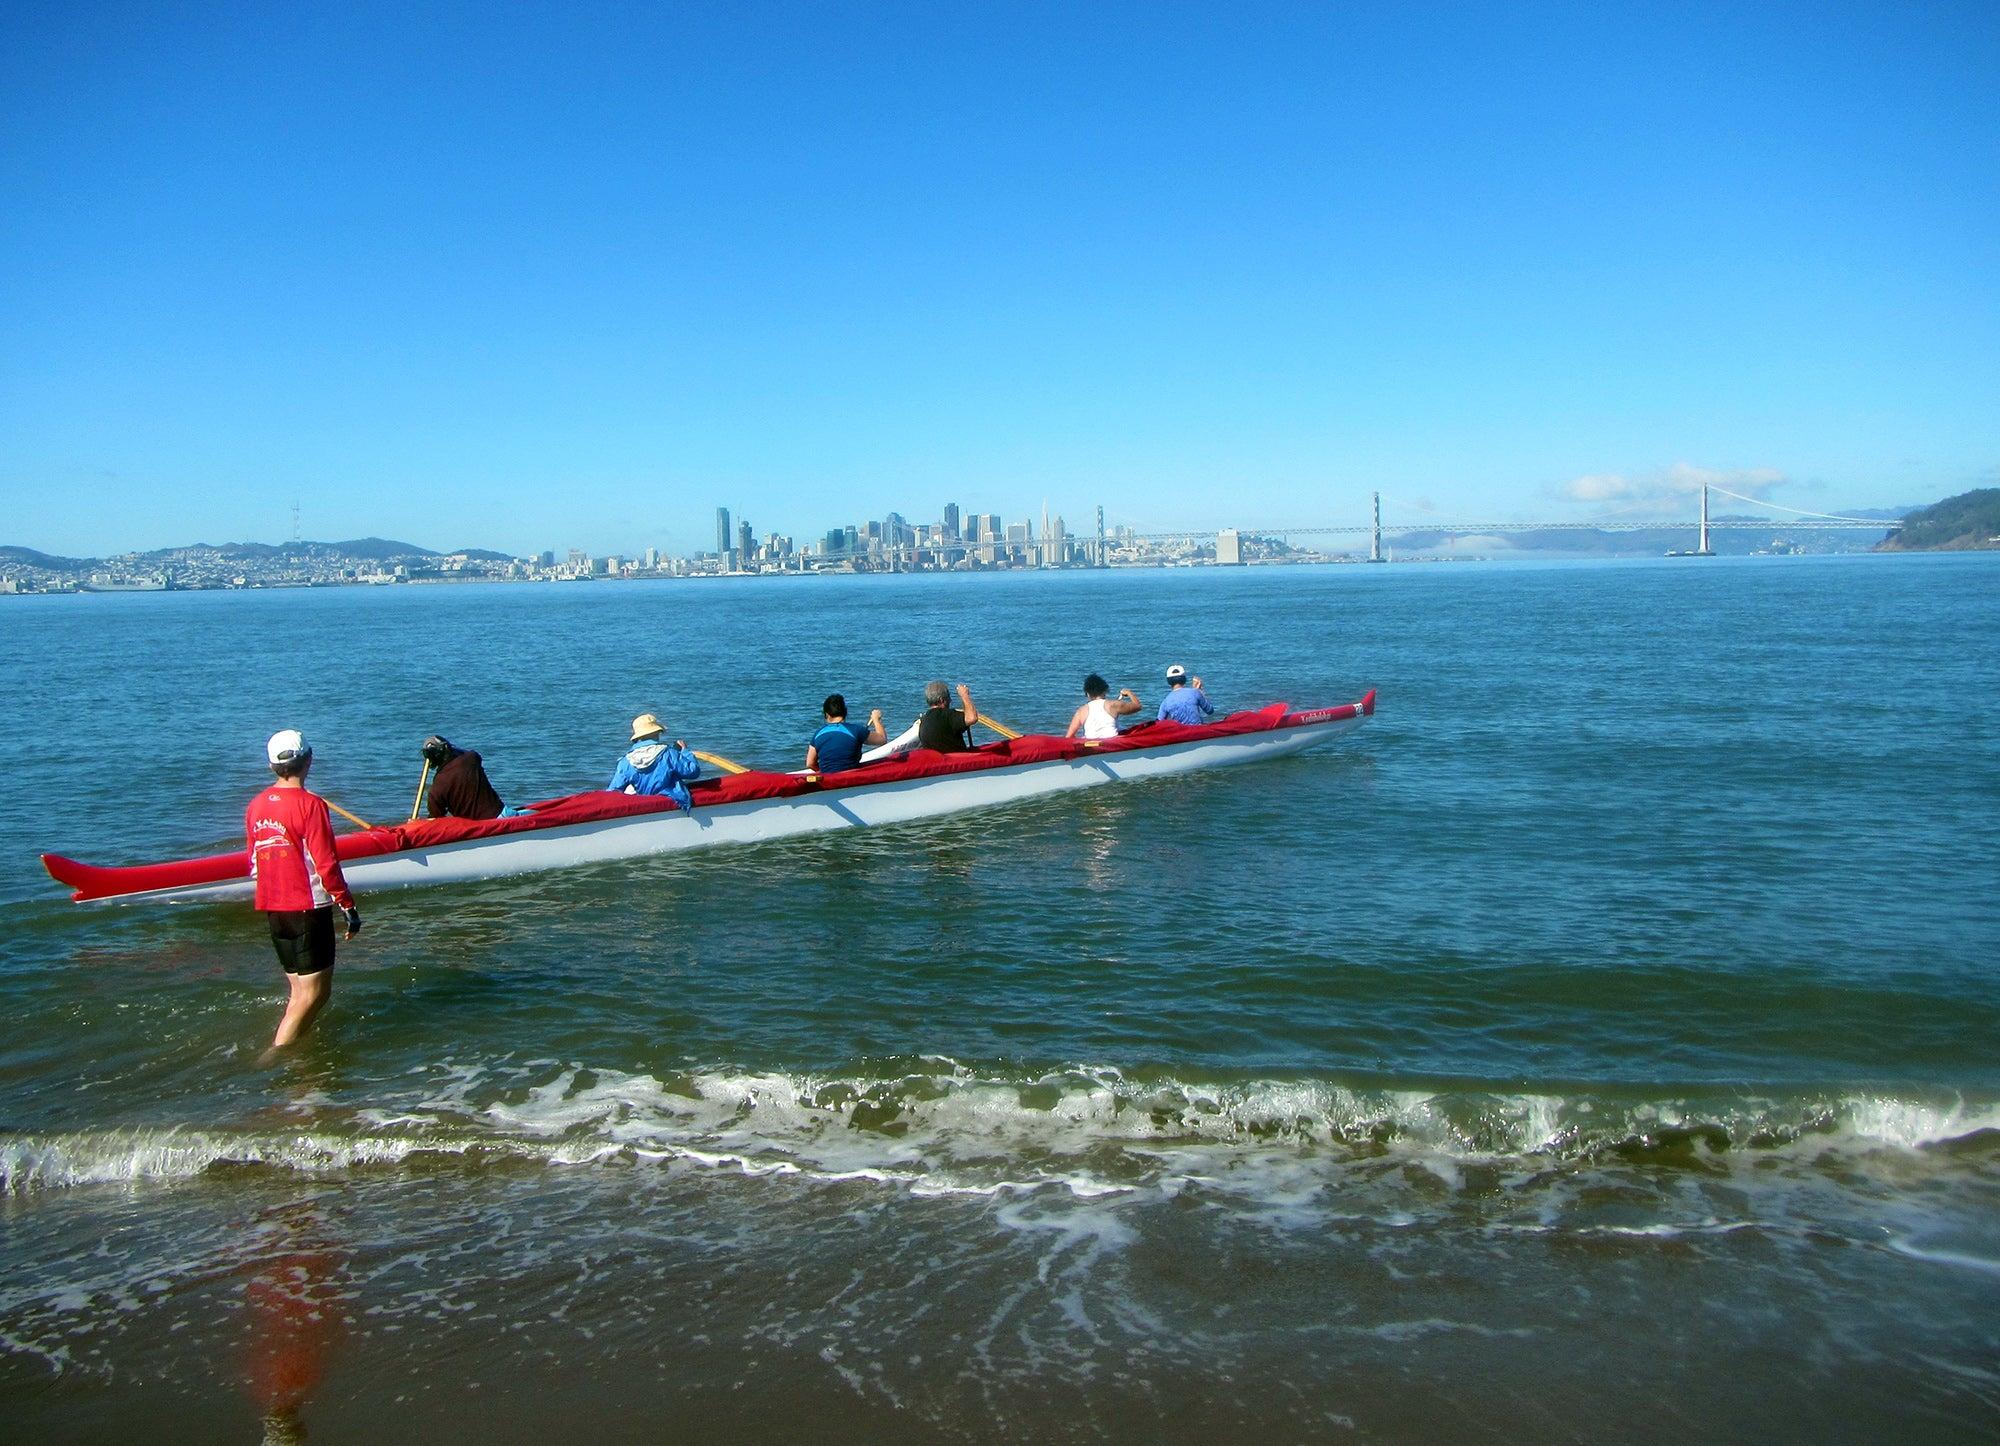 Outrigger canoers with O Kalani Outrigger Canoe Club, Alameda